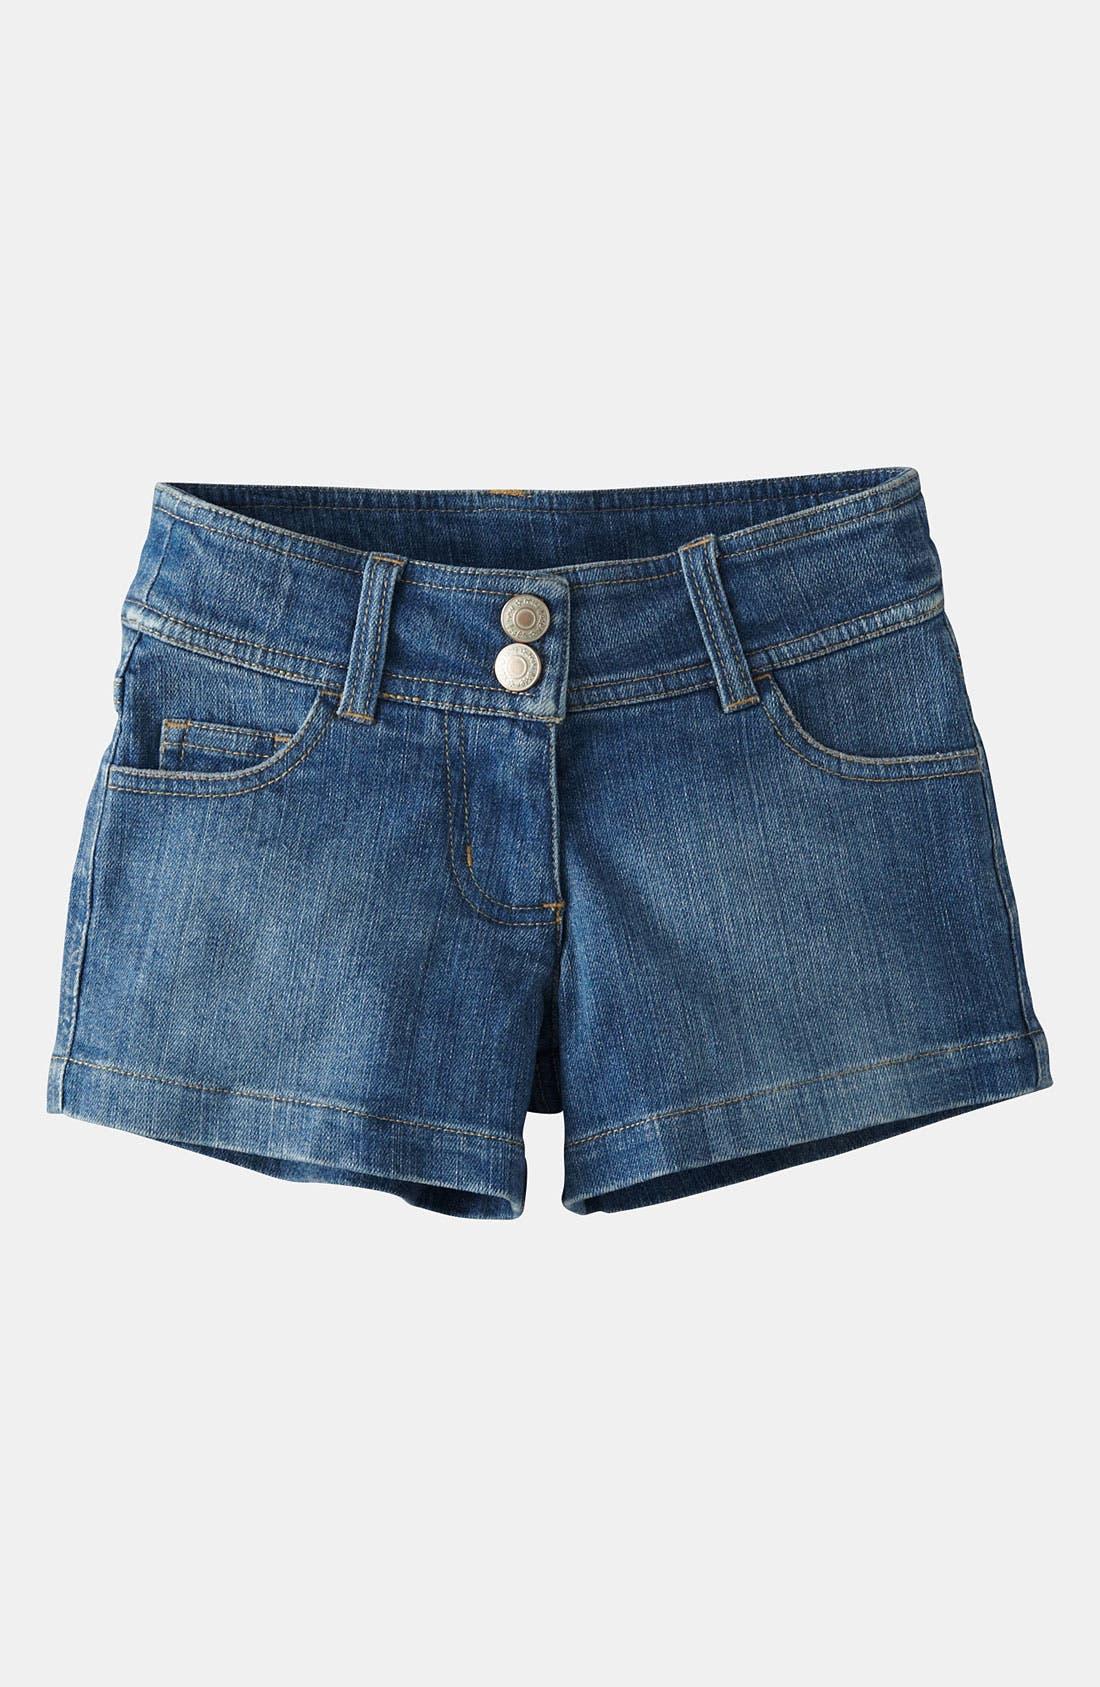 Main Image - Mini Boden 'Heart Pocket' Denim Shorts (Toddler, Little Girls & Big Girls)